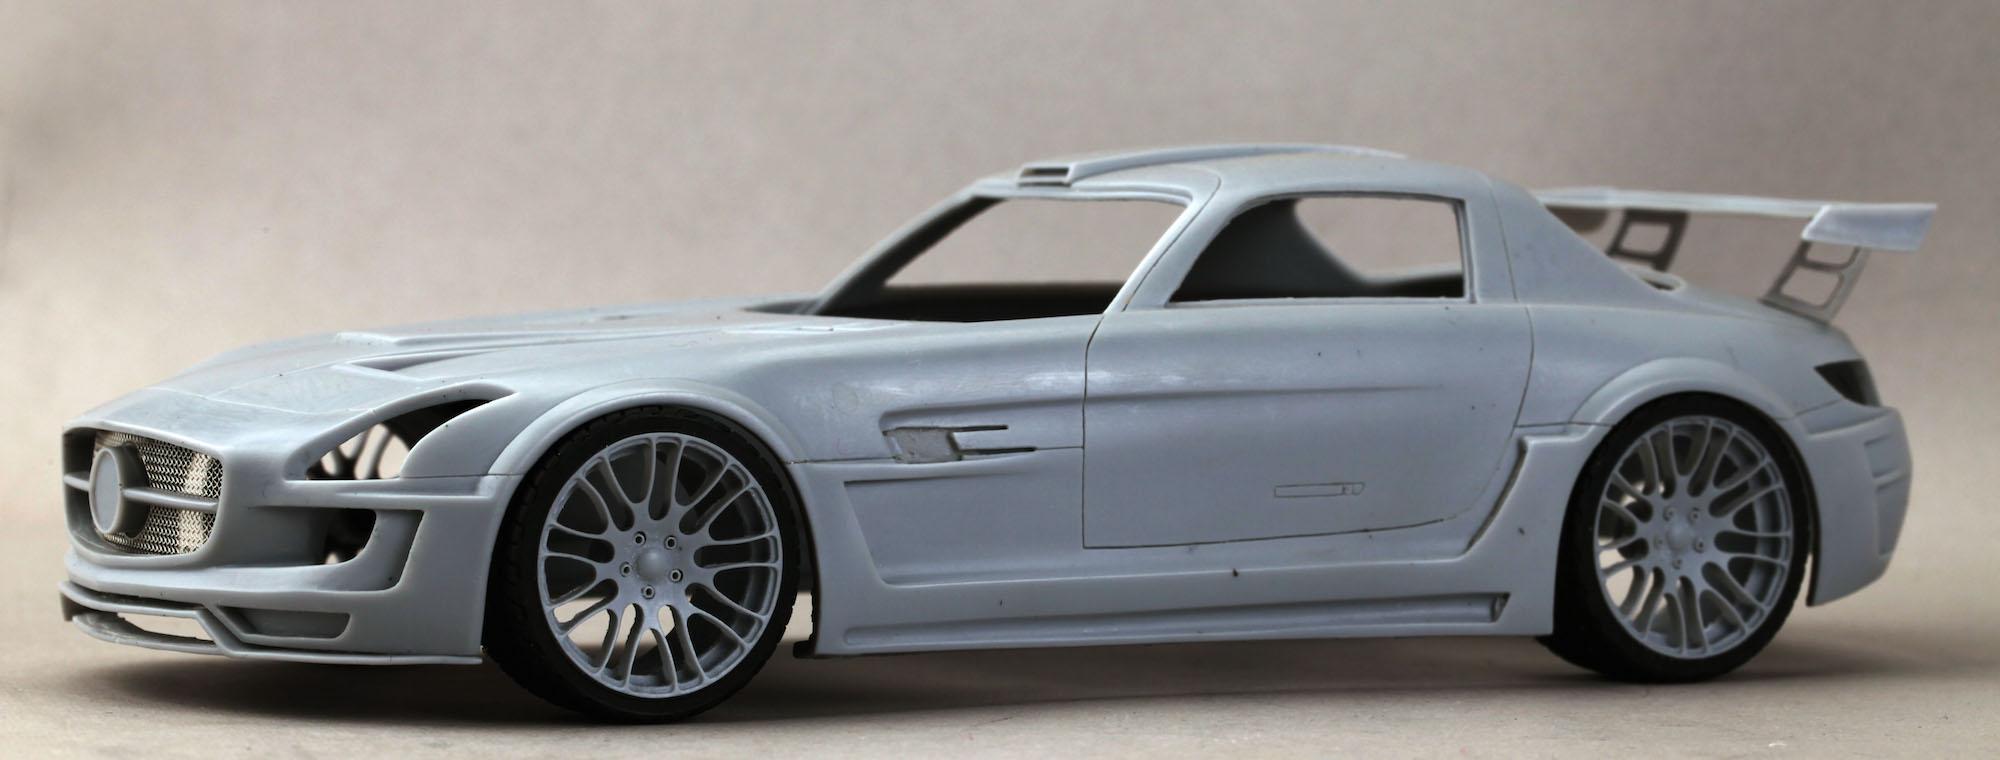 1 24 hamann hawk sls super detail set hd03 0143 hobby for Mercedes benz detailing